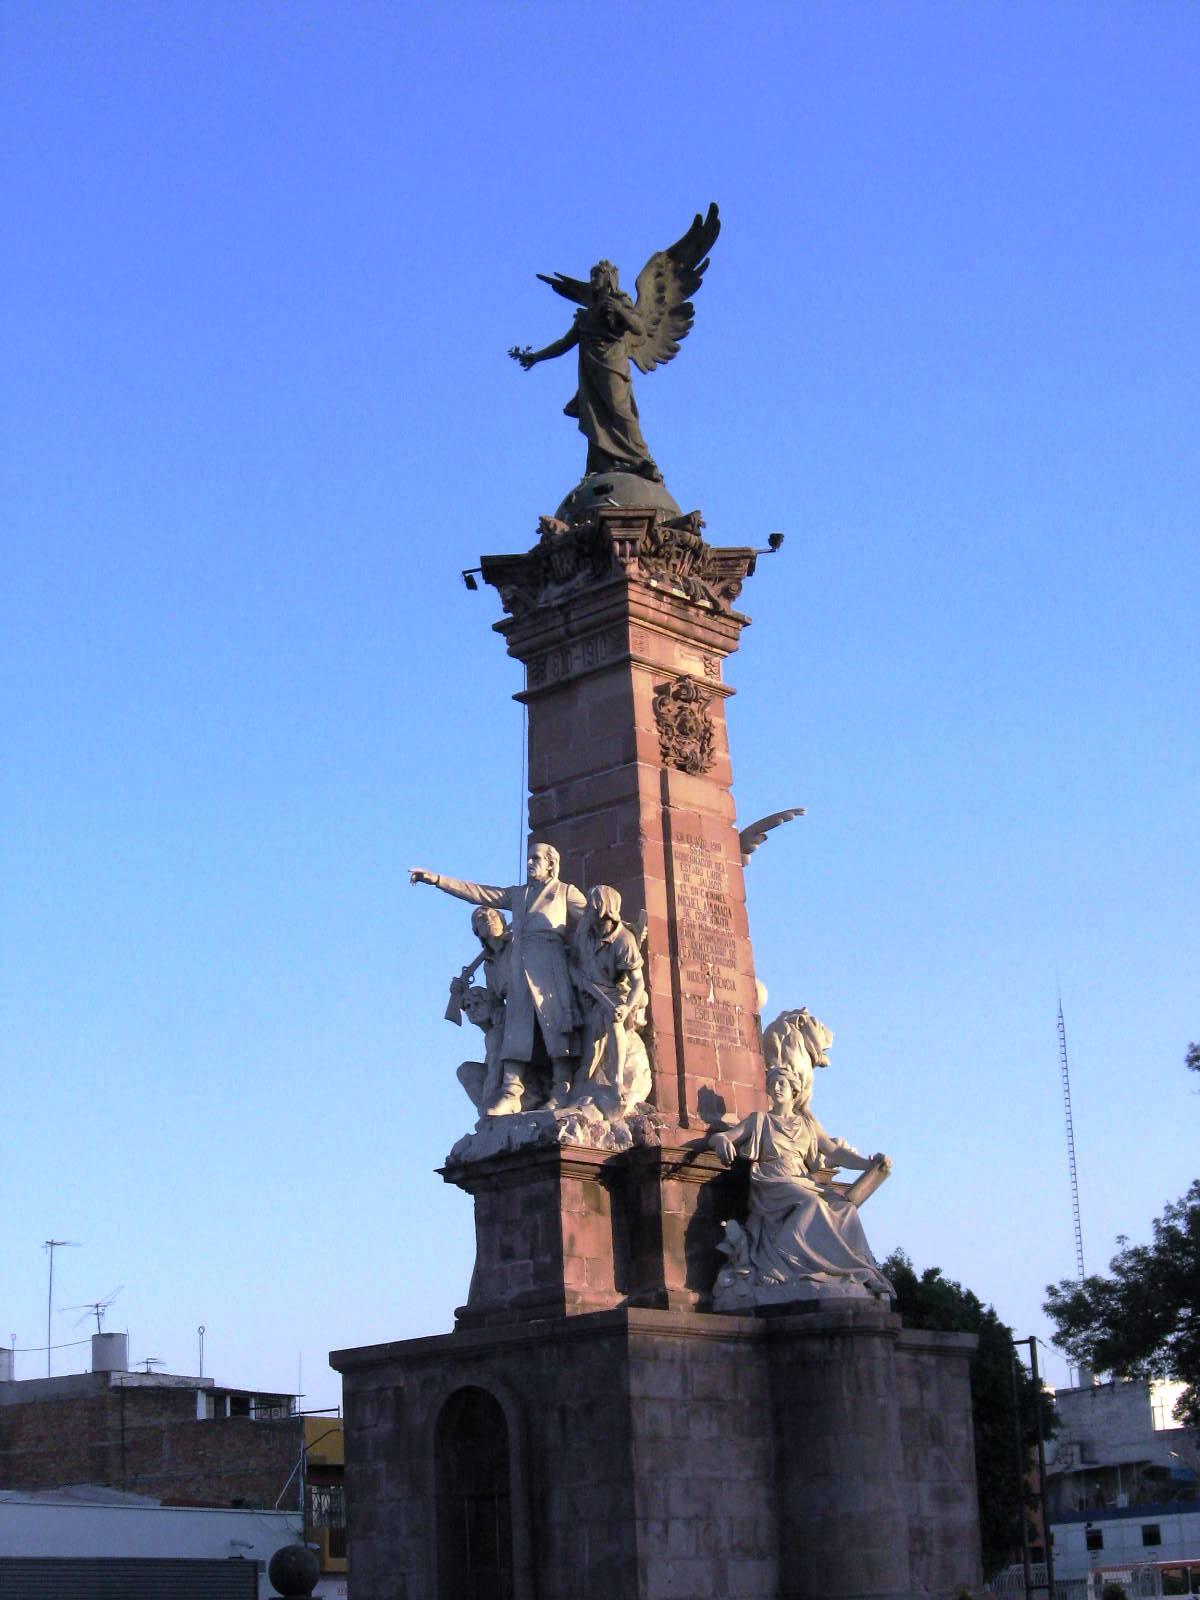 Depiction of Calzada Independencia